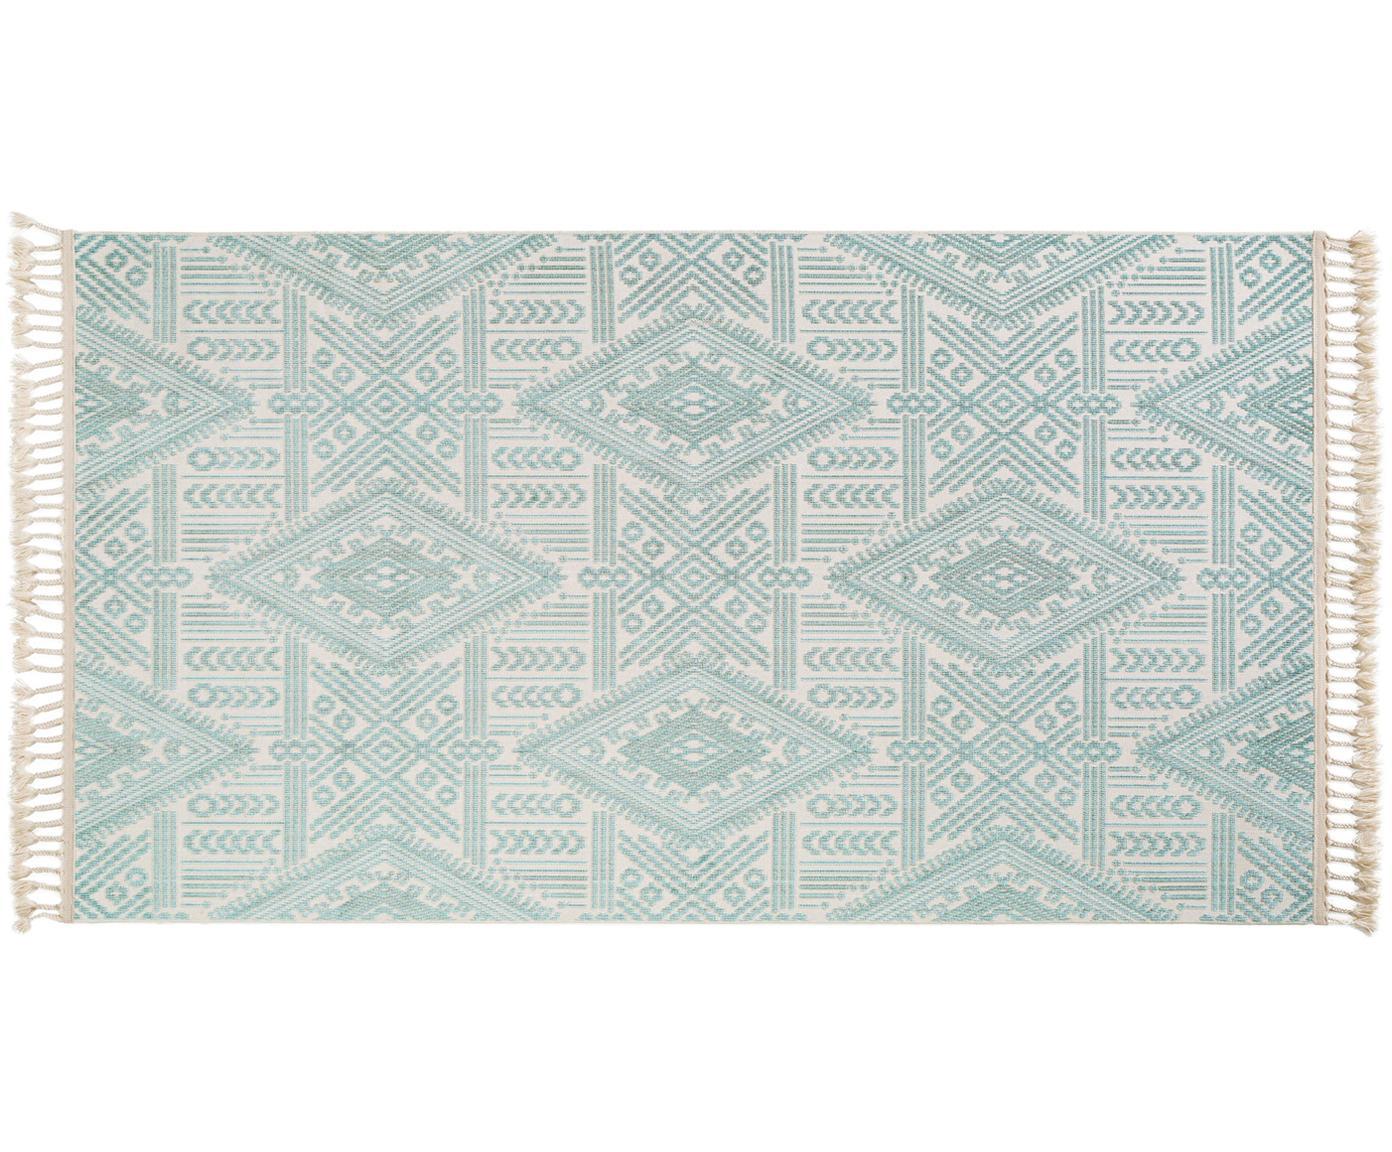 Alfombra texturizada Laila Tang, Parte superior: poliéster, Reverso: algodón, Crema, turquesa, An 80 x L 150 cm (Tamaño XS)